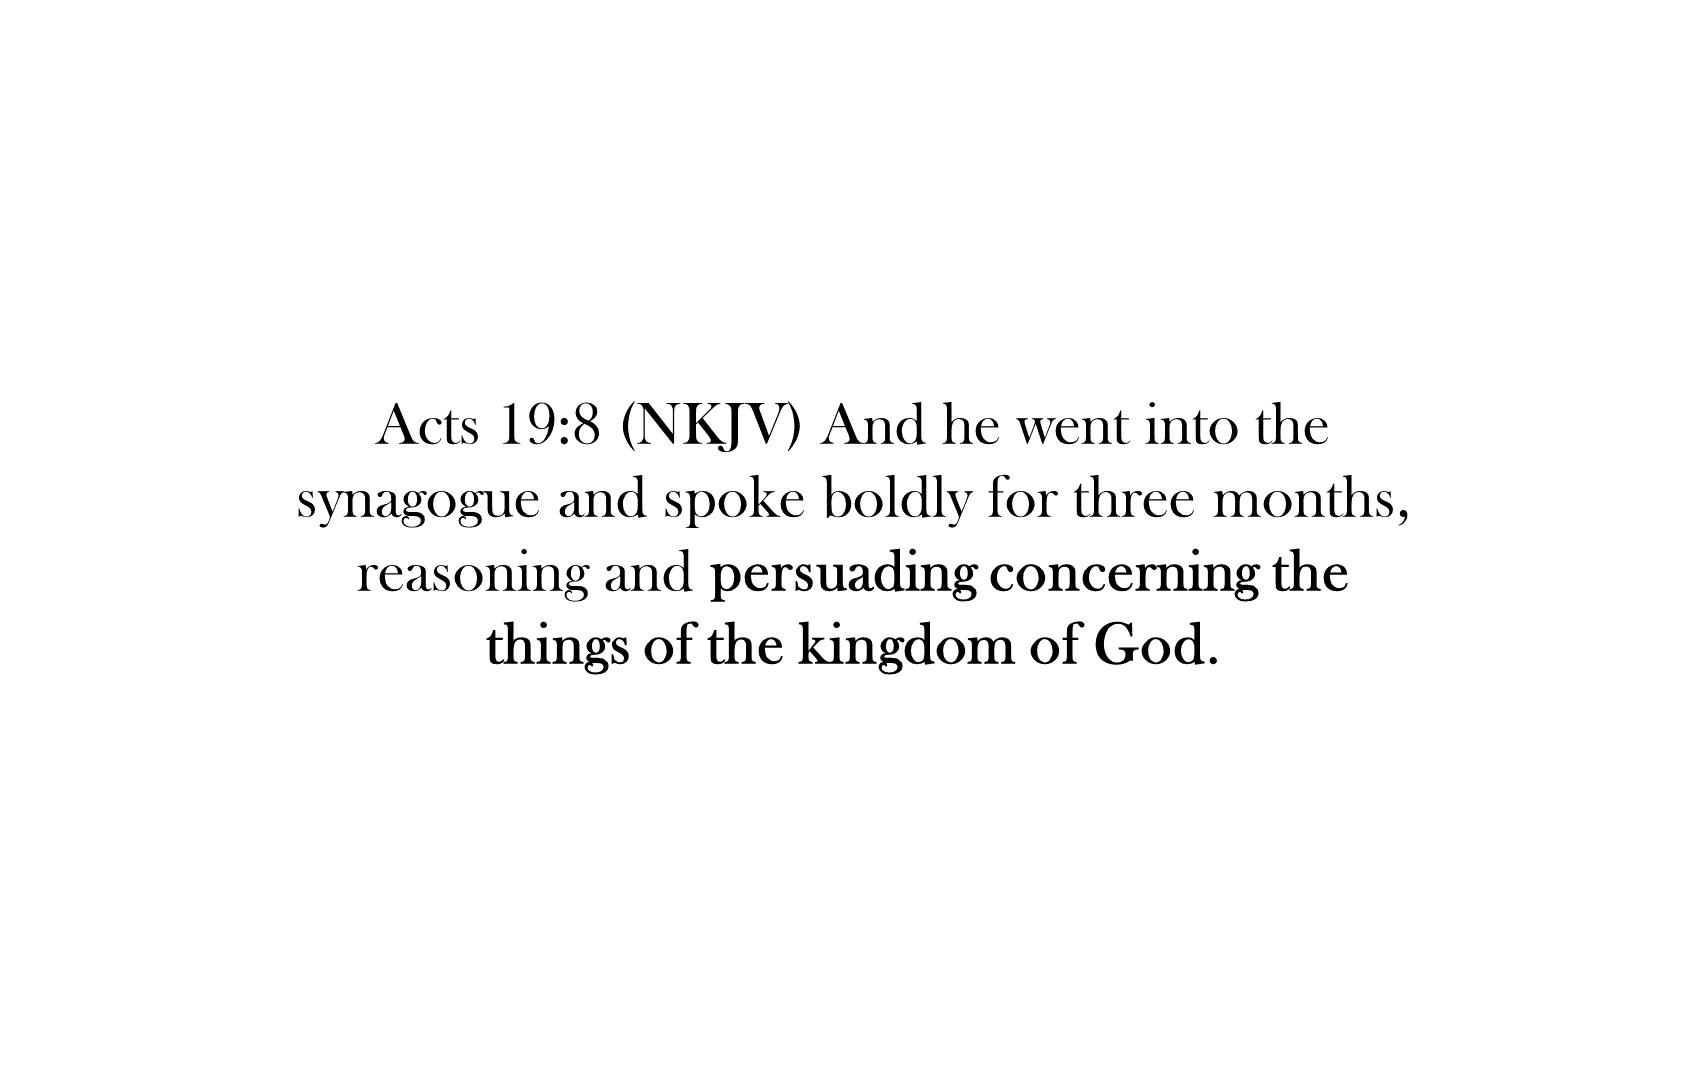 ESH-20 - The Discipline Of Disciple-Making - Seeing, Understanding, Entering, Living, & Seeking The Kingdom Of God ( (8)